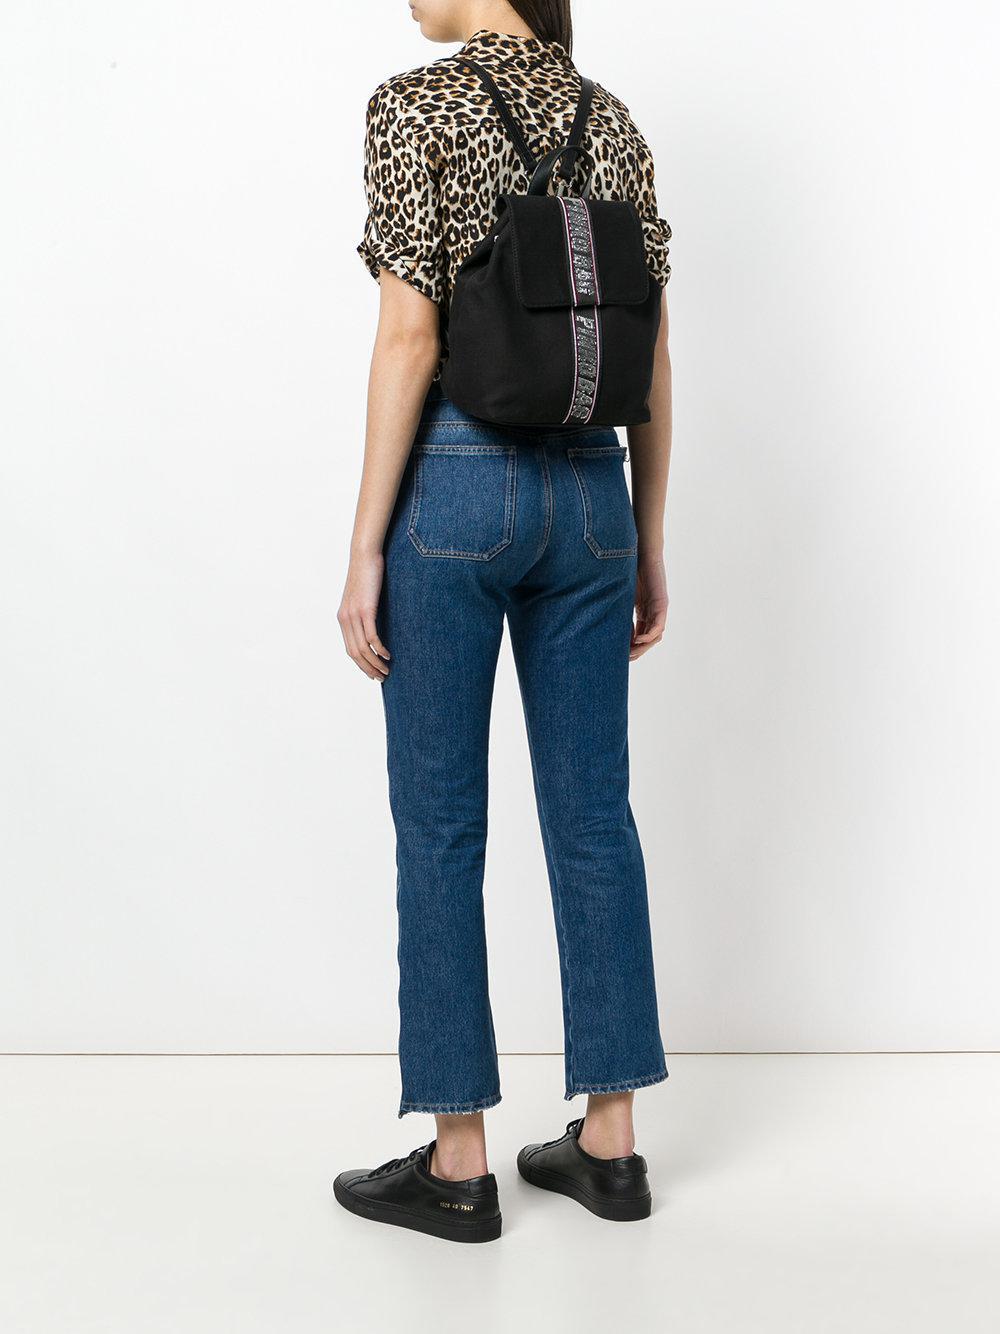 Pinko Cotton Embellished Brand Backpack in Black